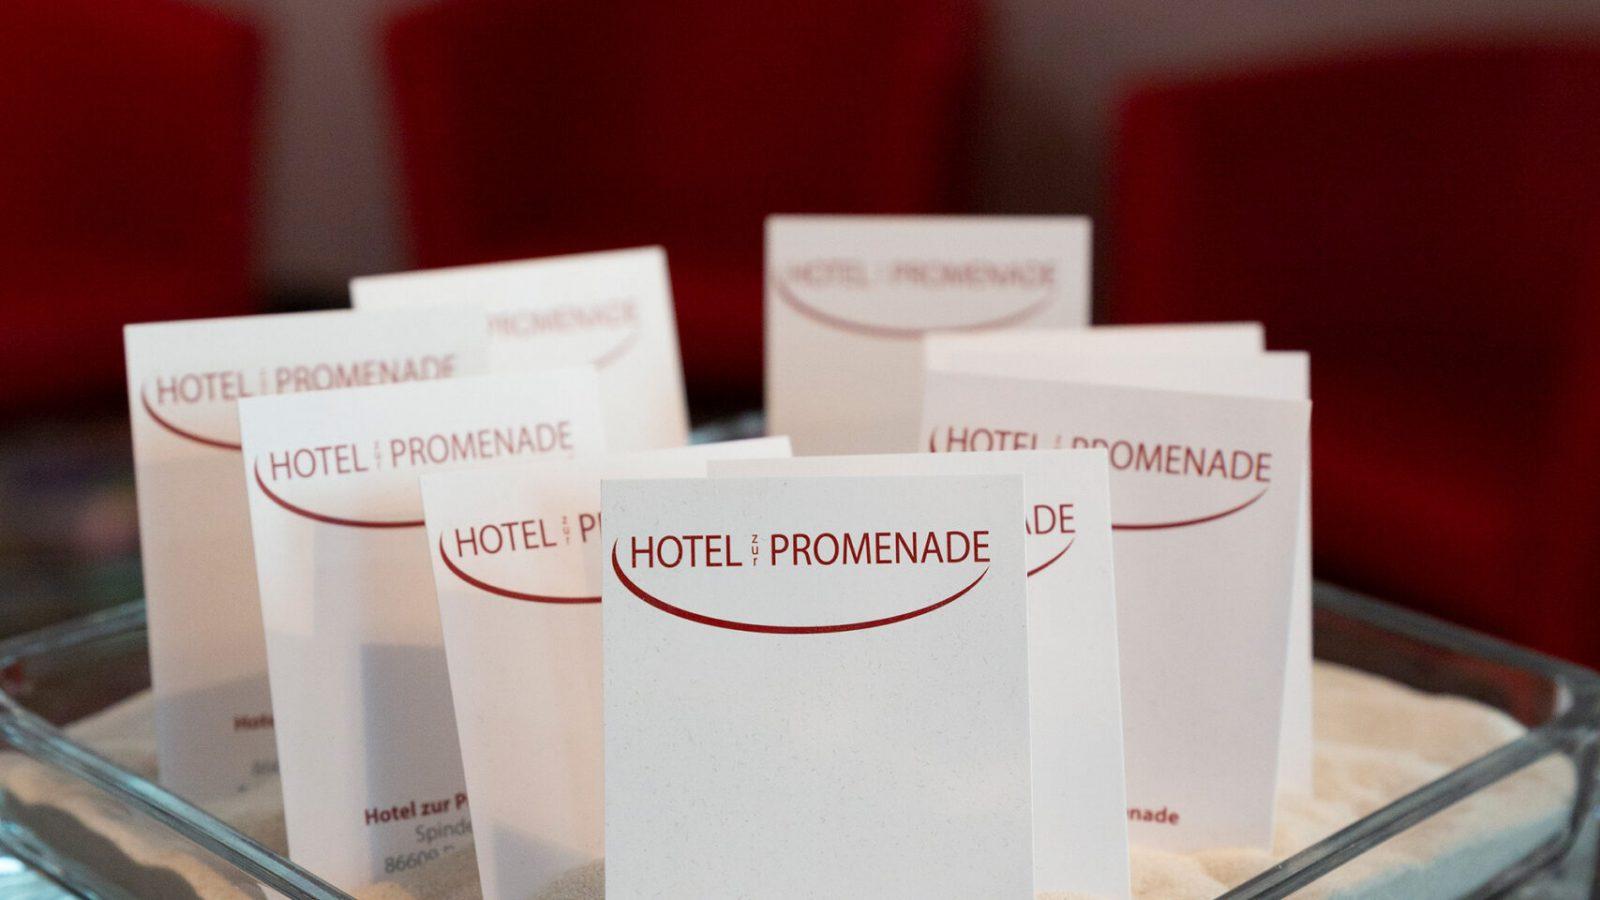 HotelPromenade_009